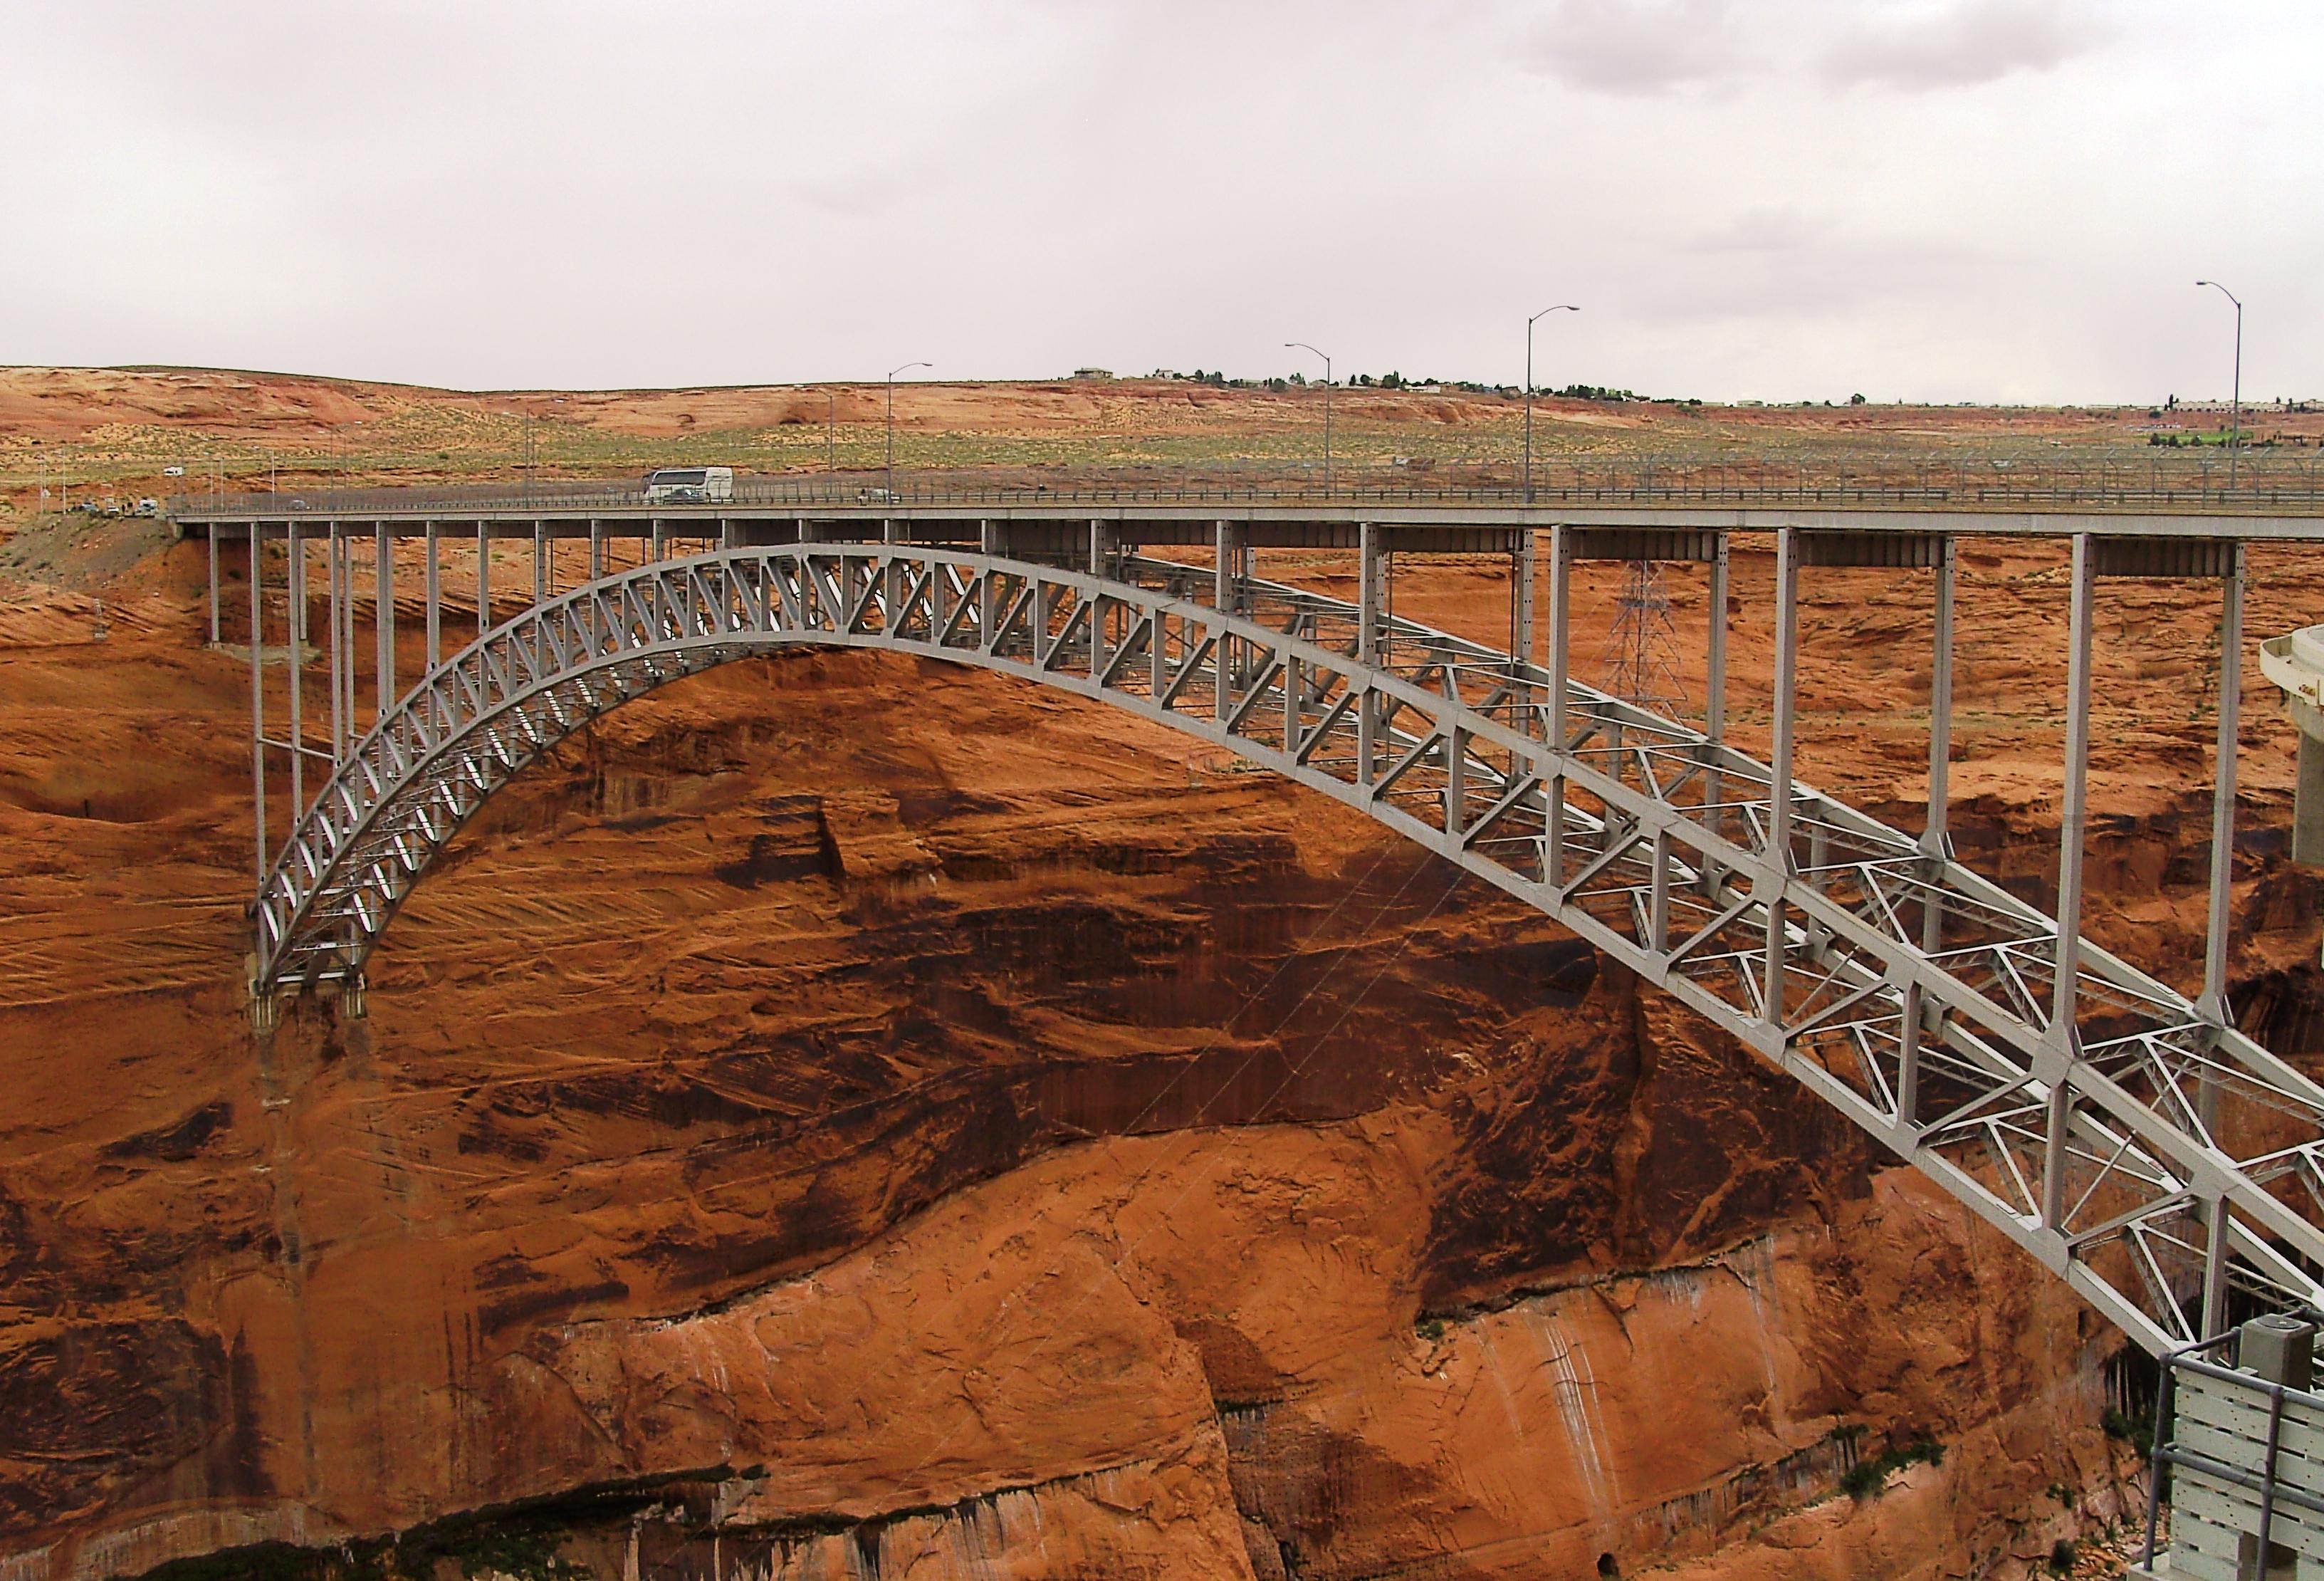 File:Glen Canyon Bridge in Arizona.jpg - Wikimedia Commons